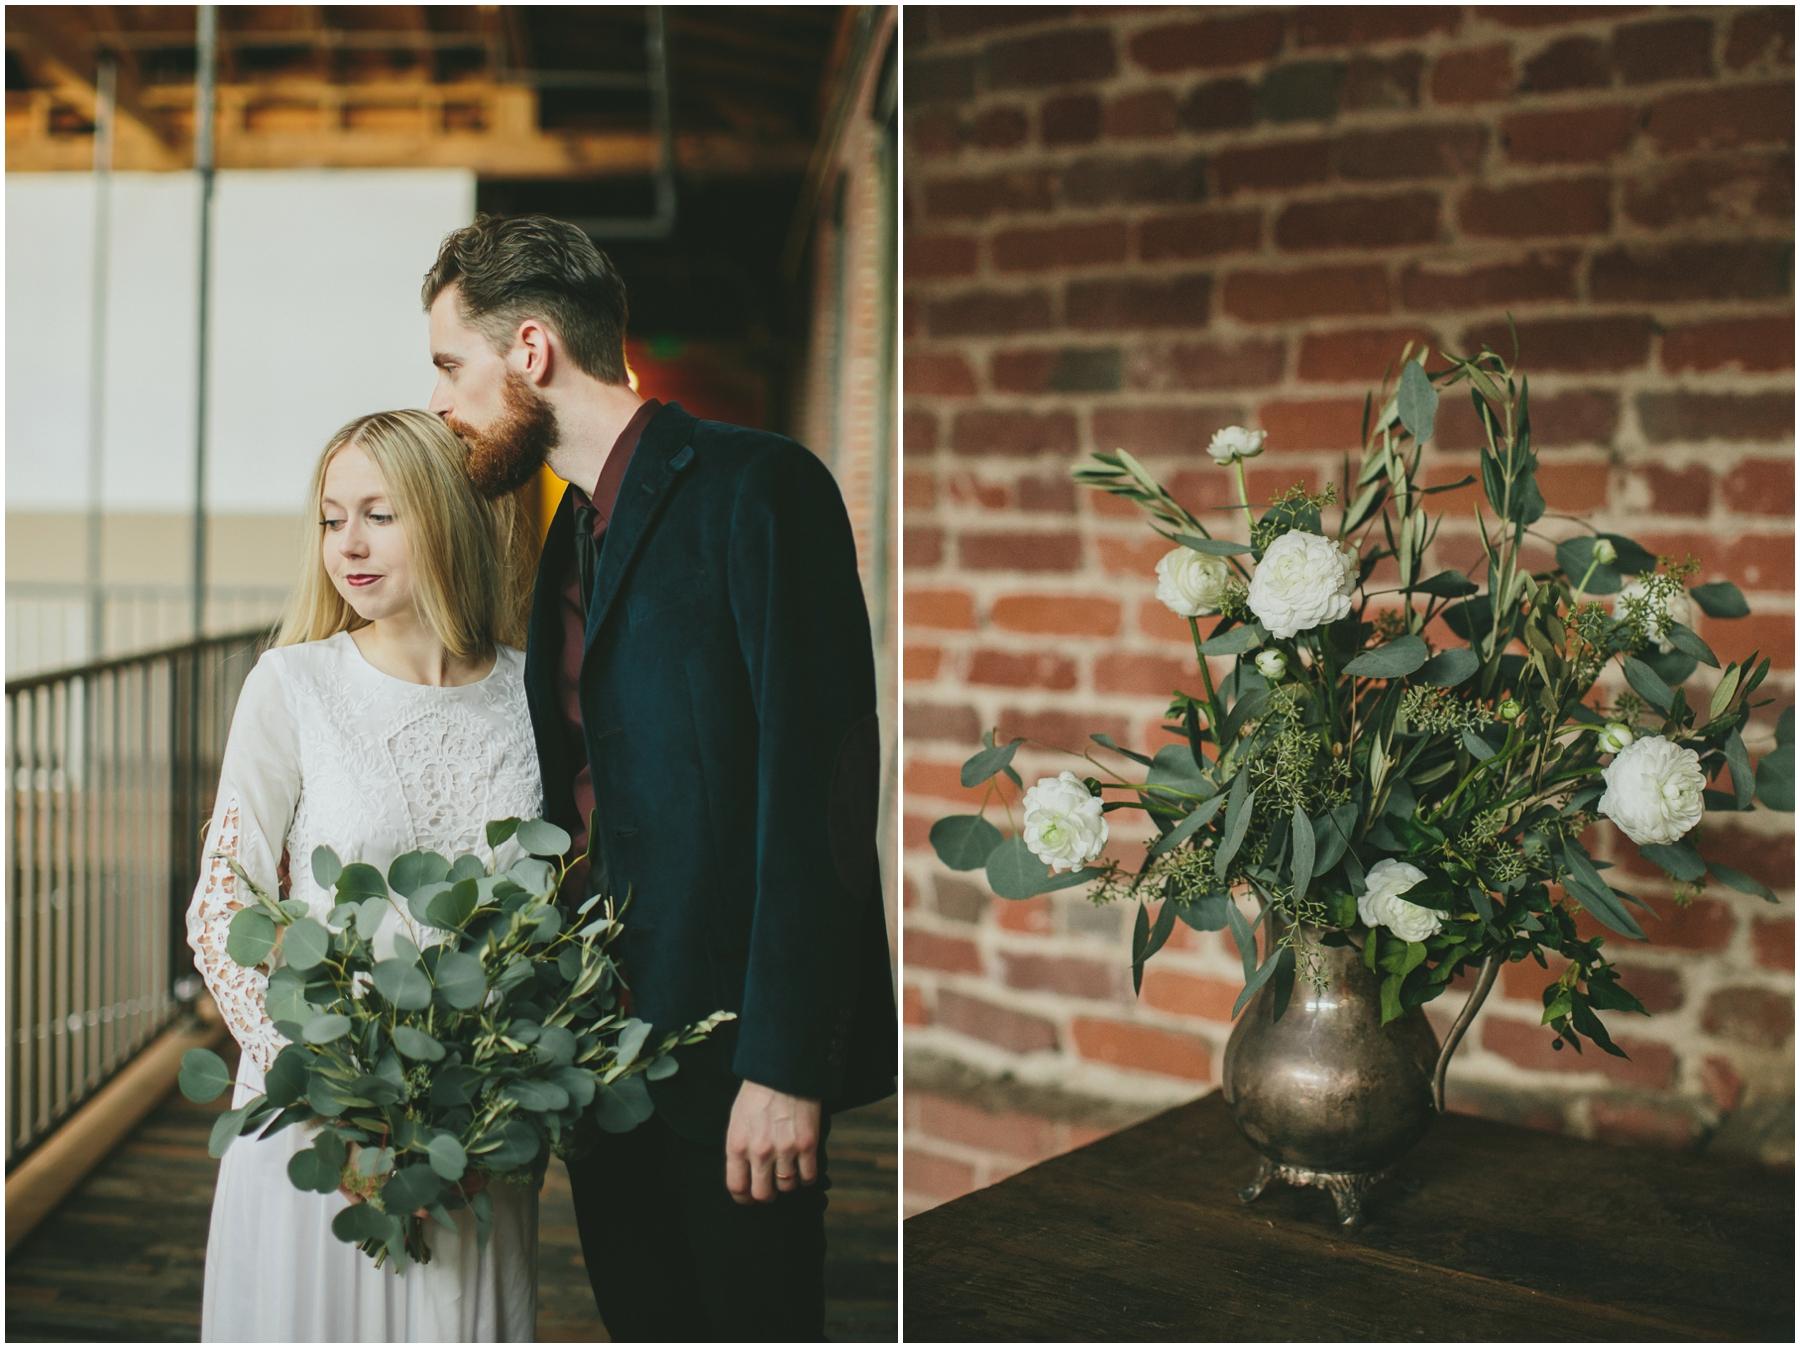 Natalie+Corey-WEDDING_KELLYBOITANO_0029